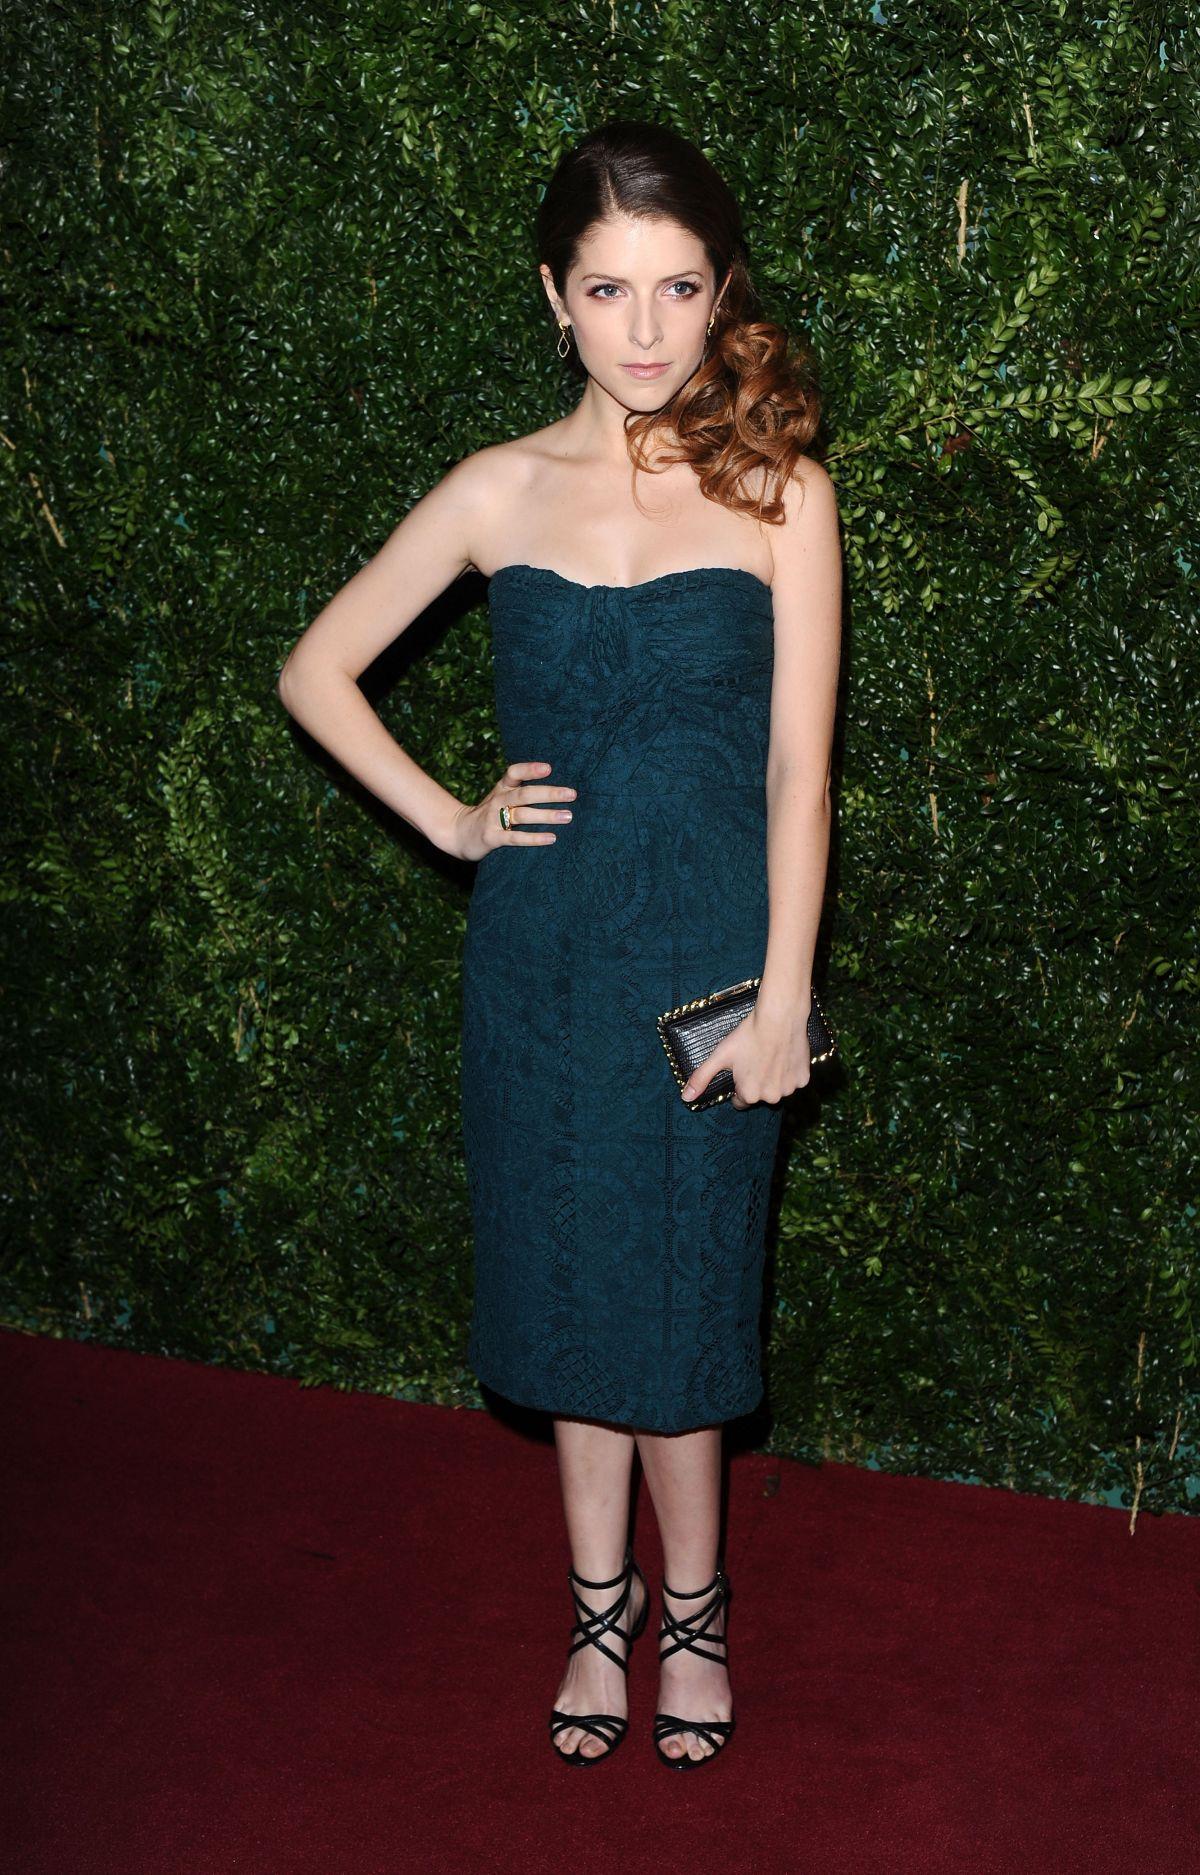 ANNA KENDRICK at 2014 London Evening Standard Theatre Awards